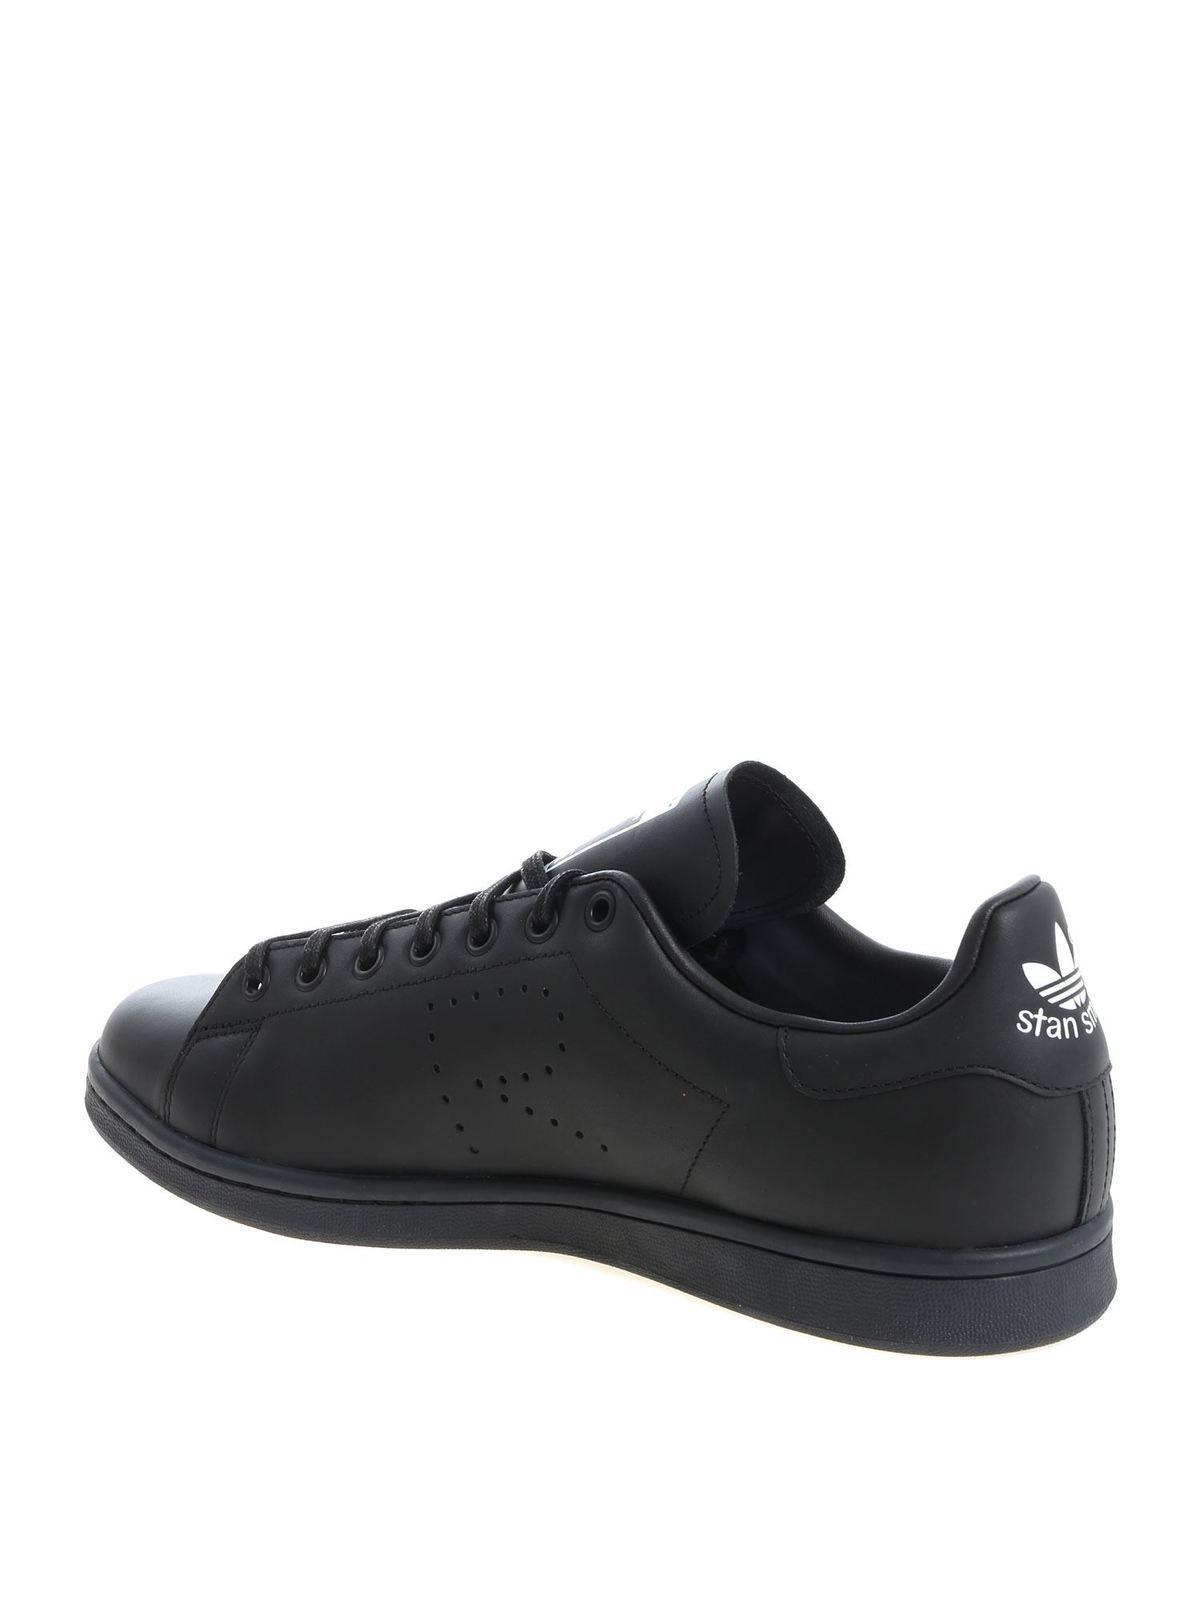 raf simons adidas black